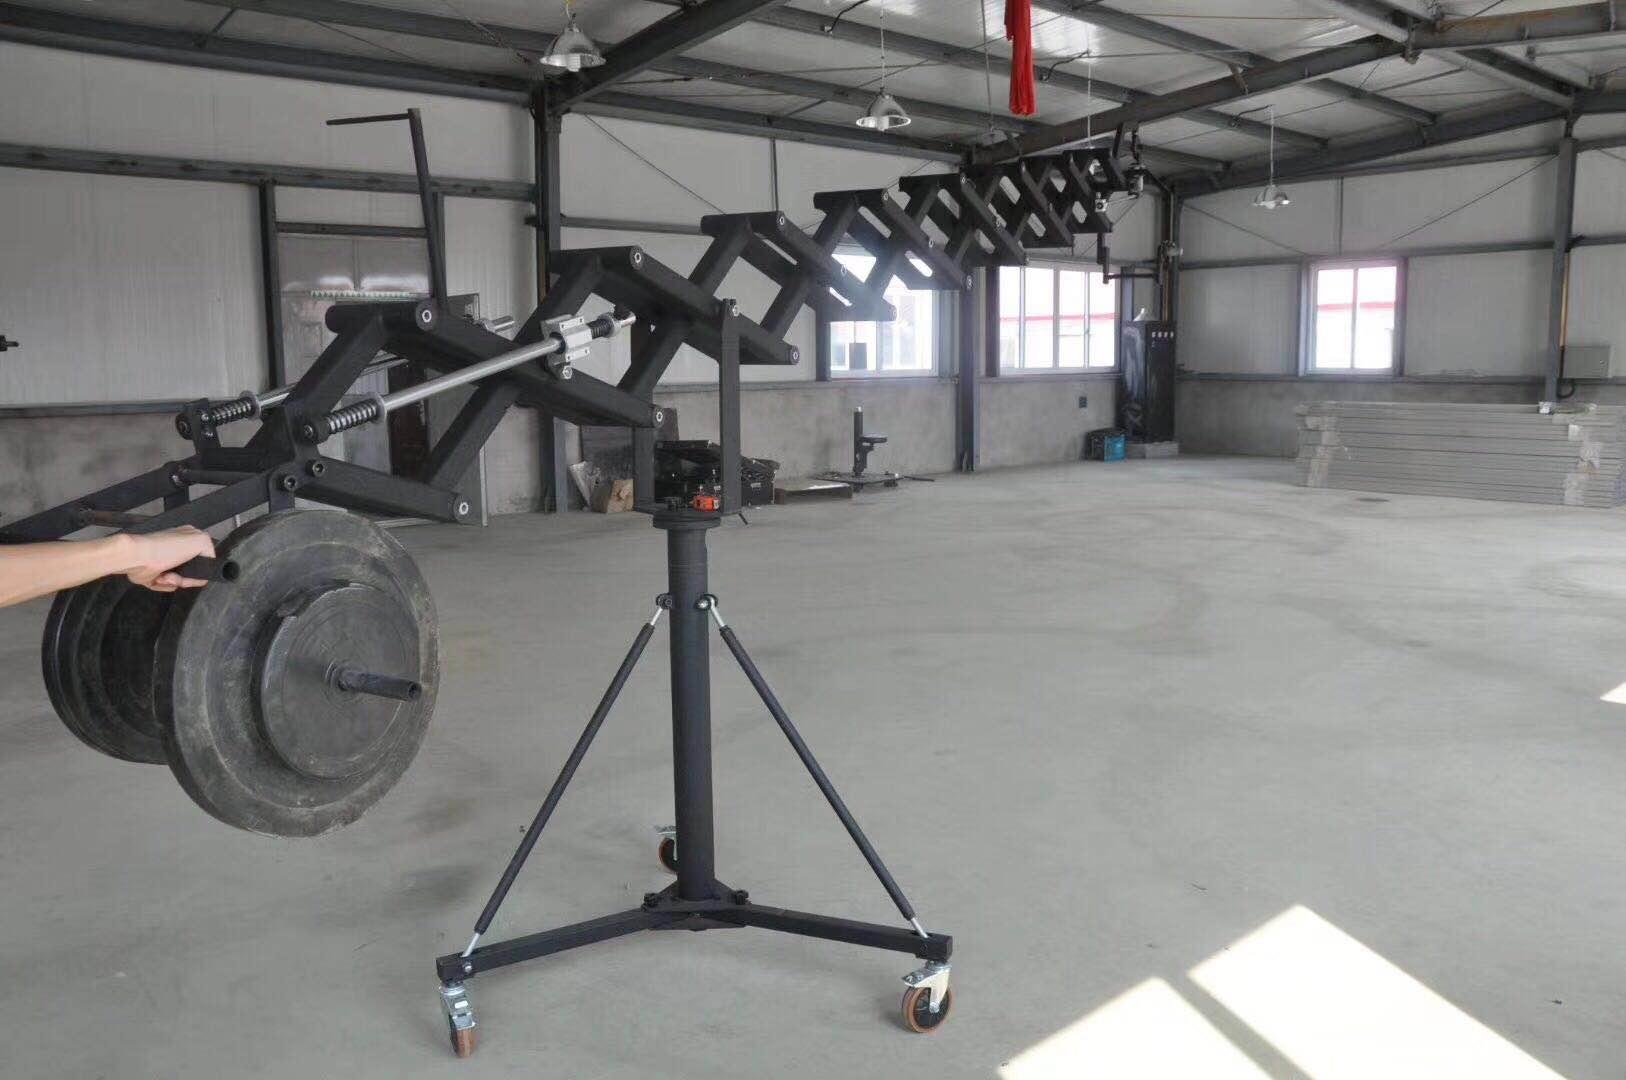 6m telescopic camera jib crane